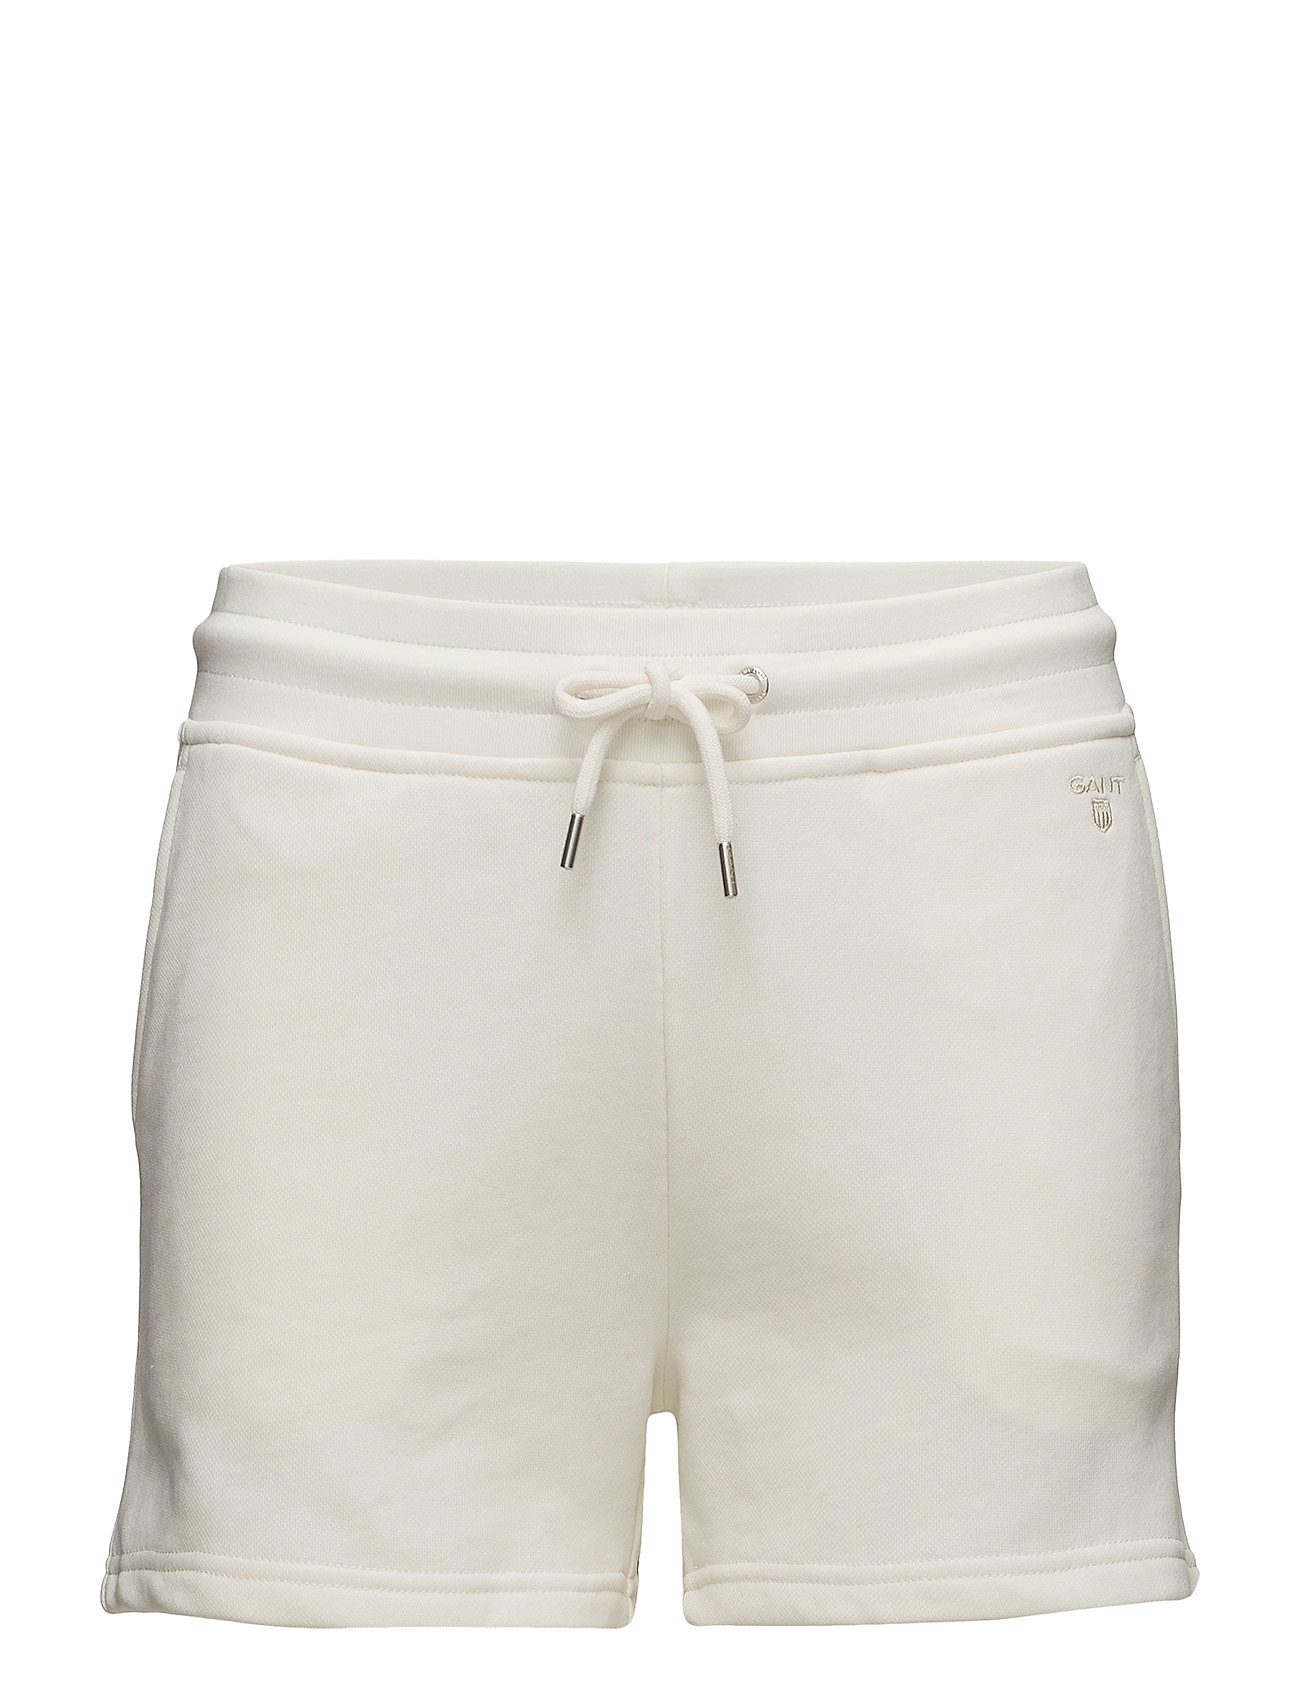 Gant O1. TONAL SHIELD SWEAT SHORTS - OFFWHITE